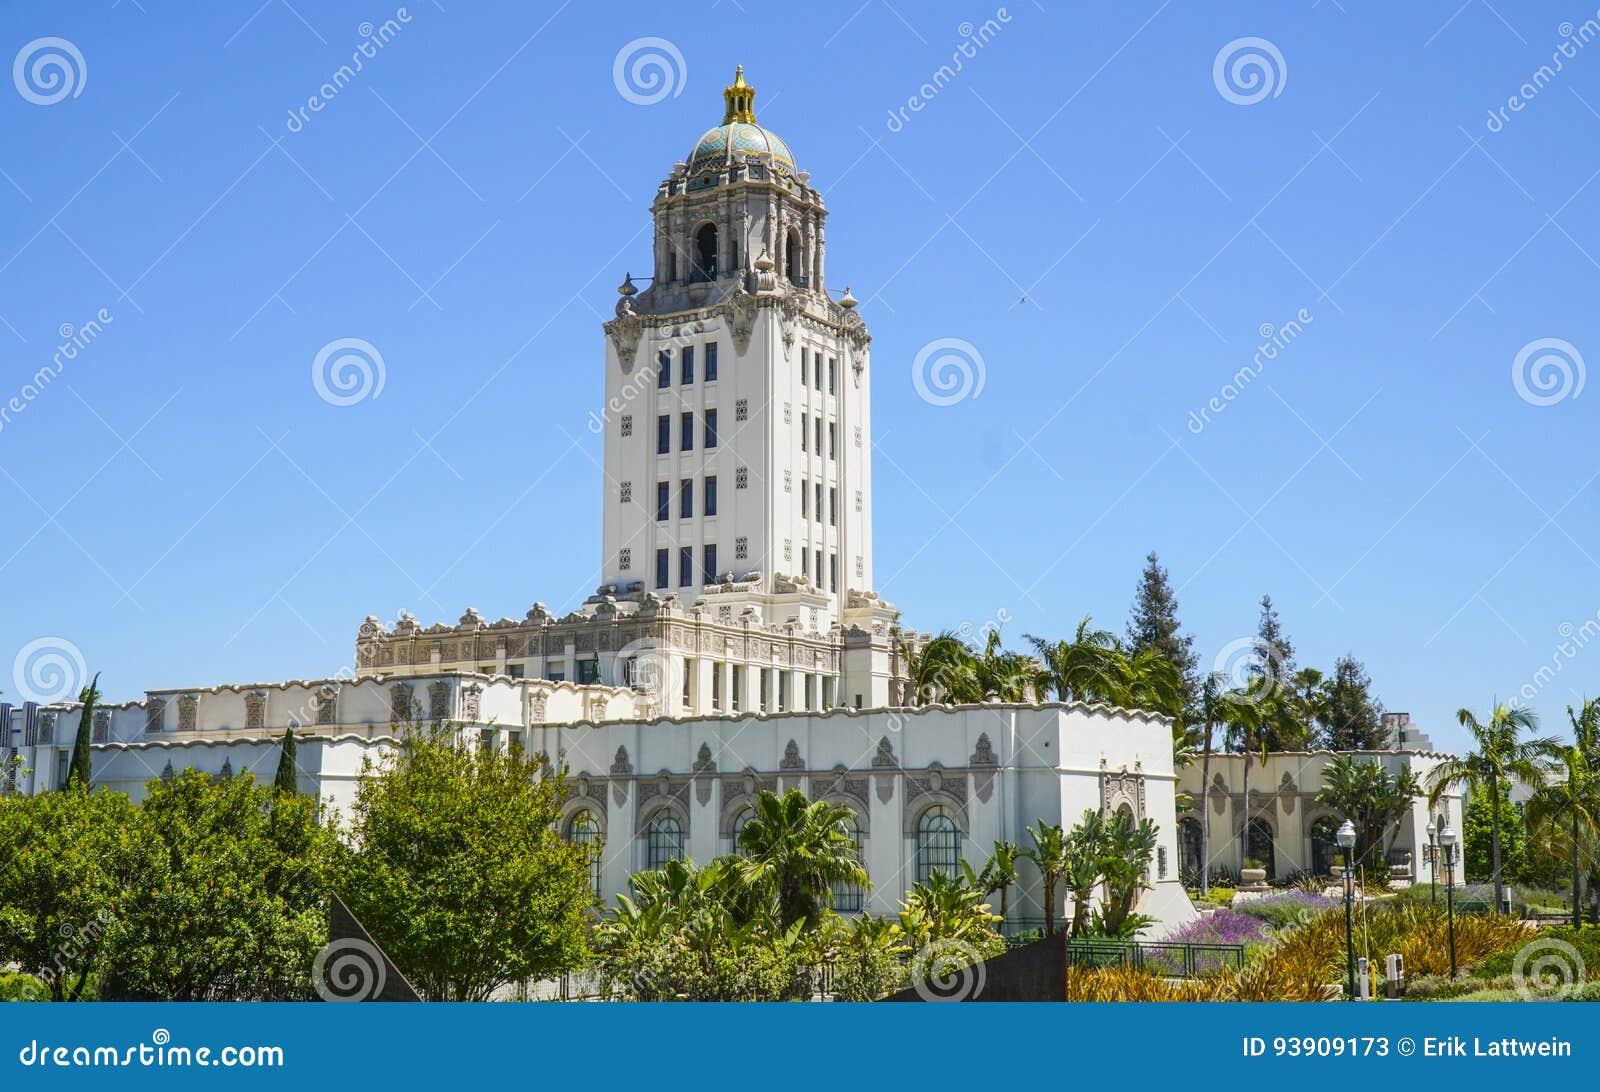 Beverly Hills City Hall i Los Angeles - LOS ANGELES - KALIFORNIEN - APRIL 20, 2017